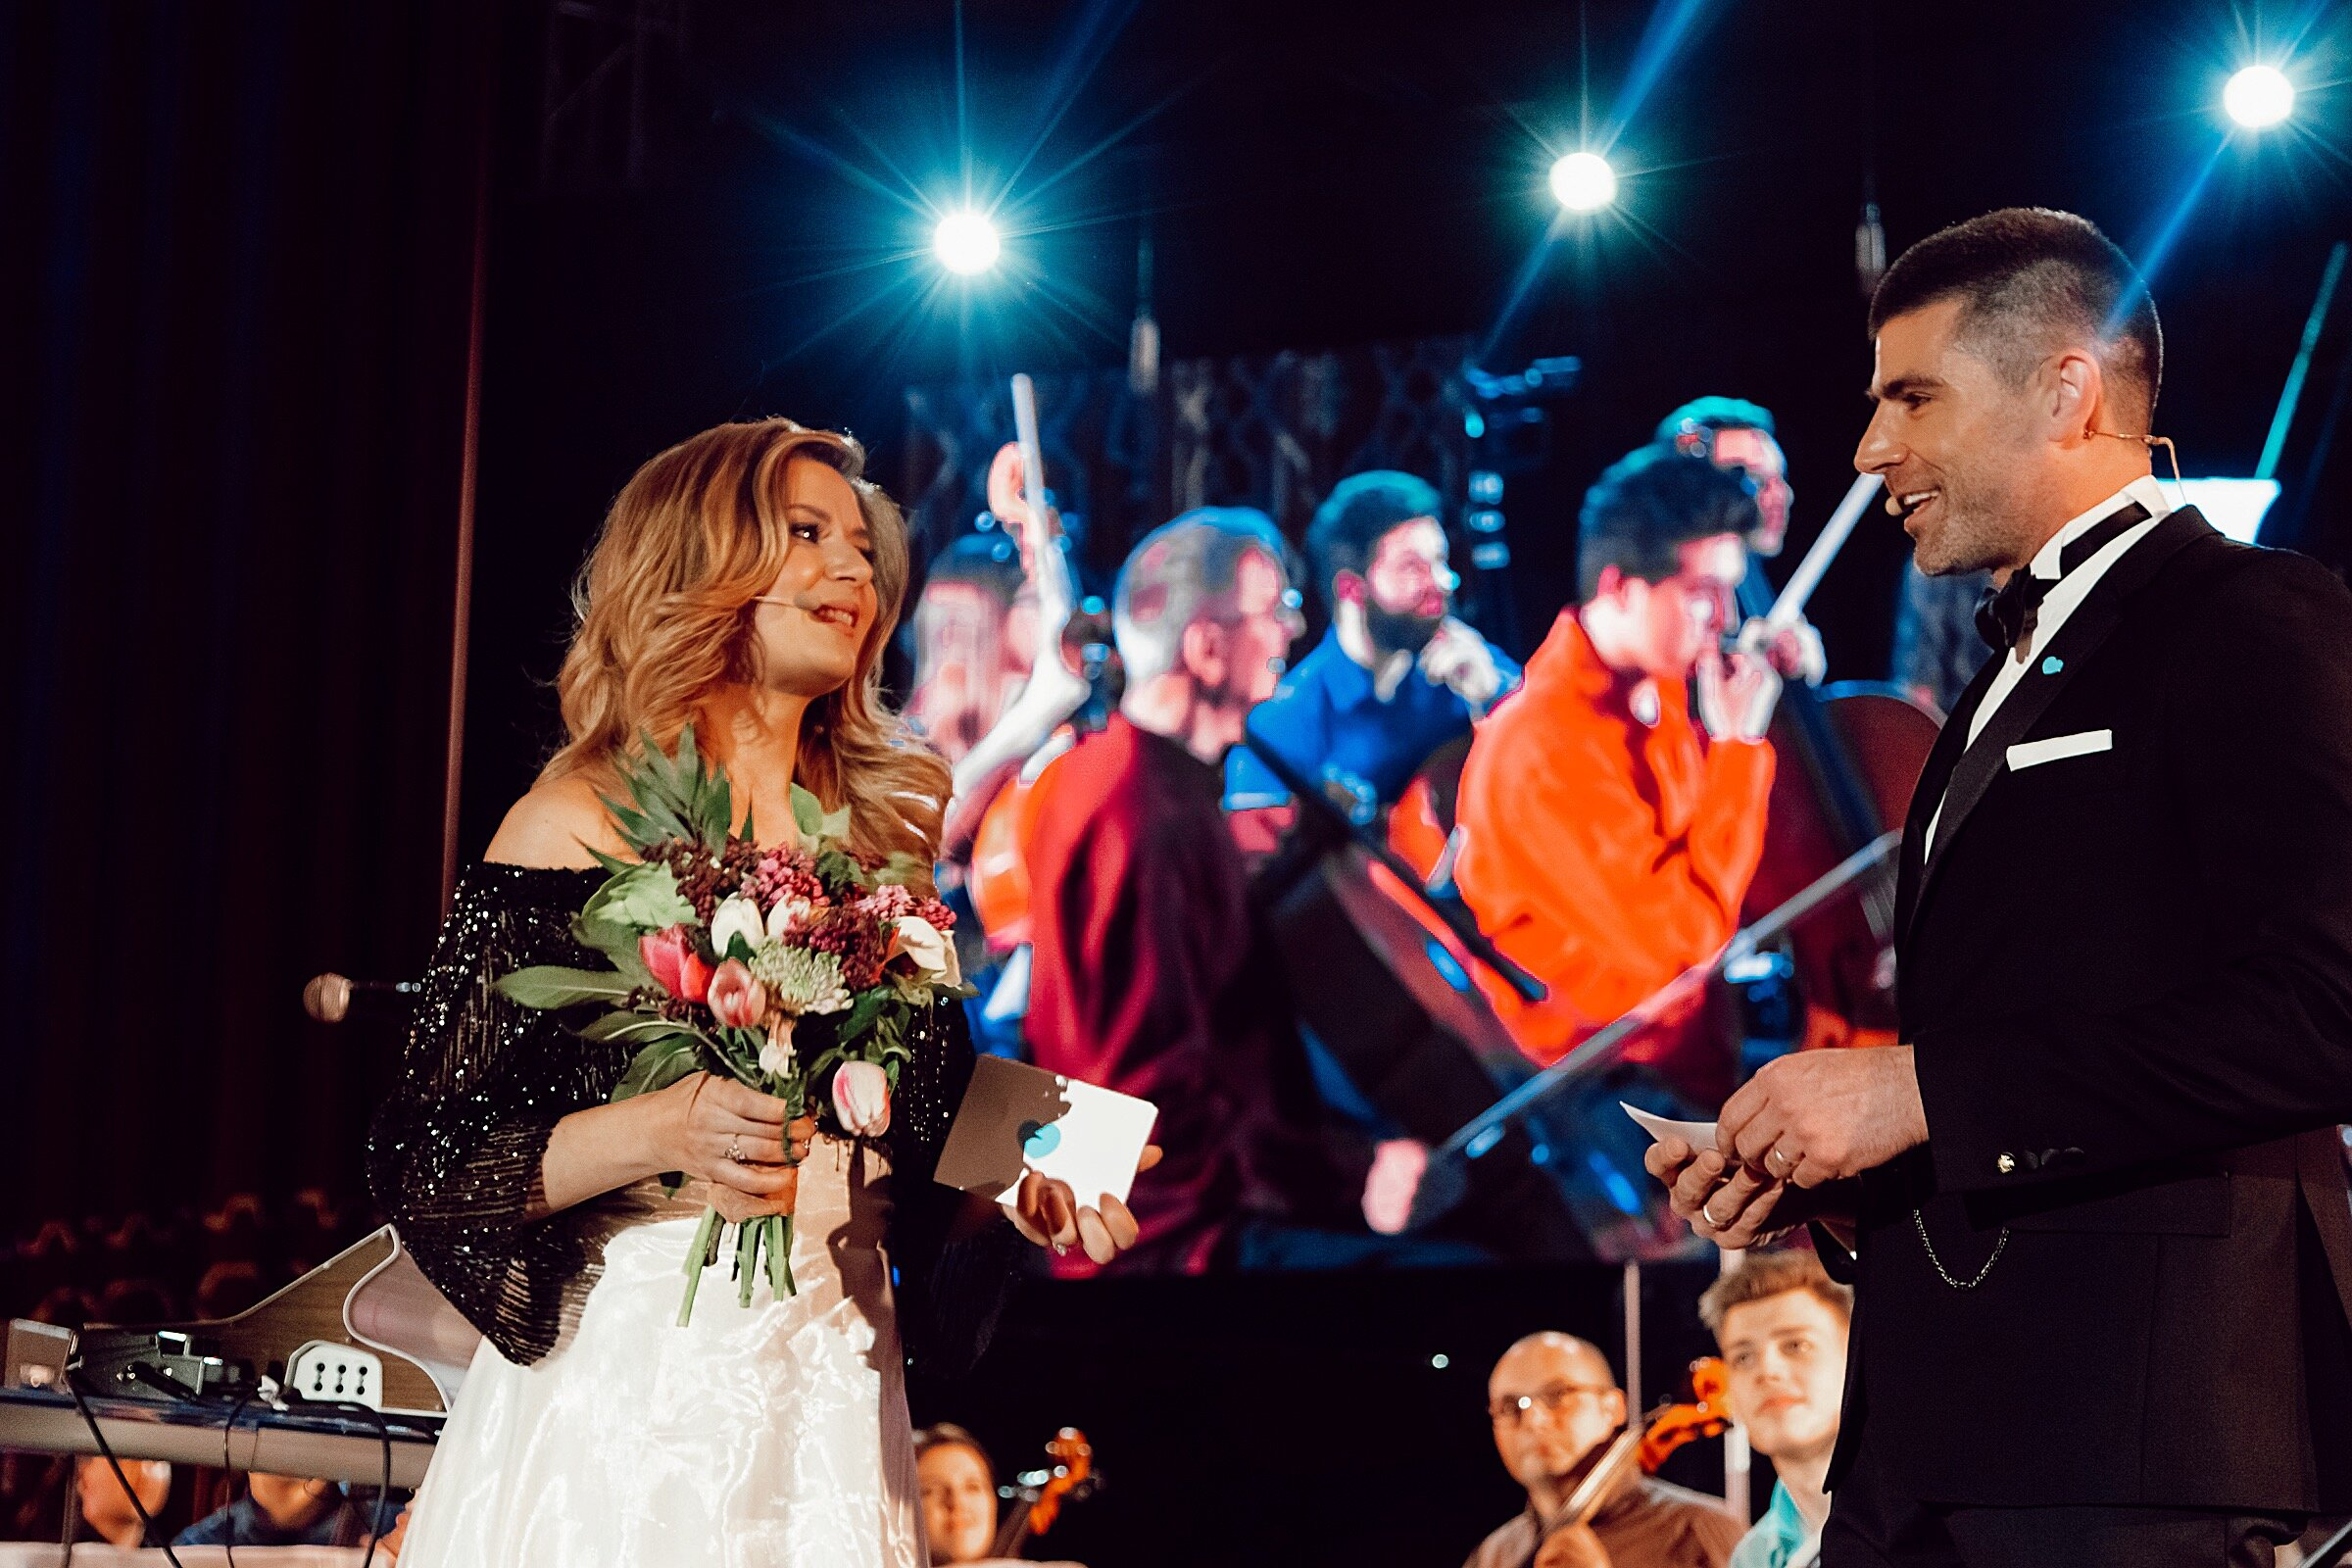 Amaslia Enache_Dragoș Bucurenci_Hope Concert 2019_Foto MIhnea Ciulei.jpg